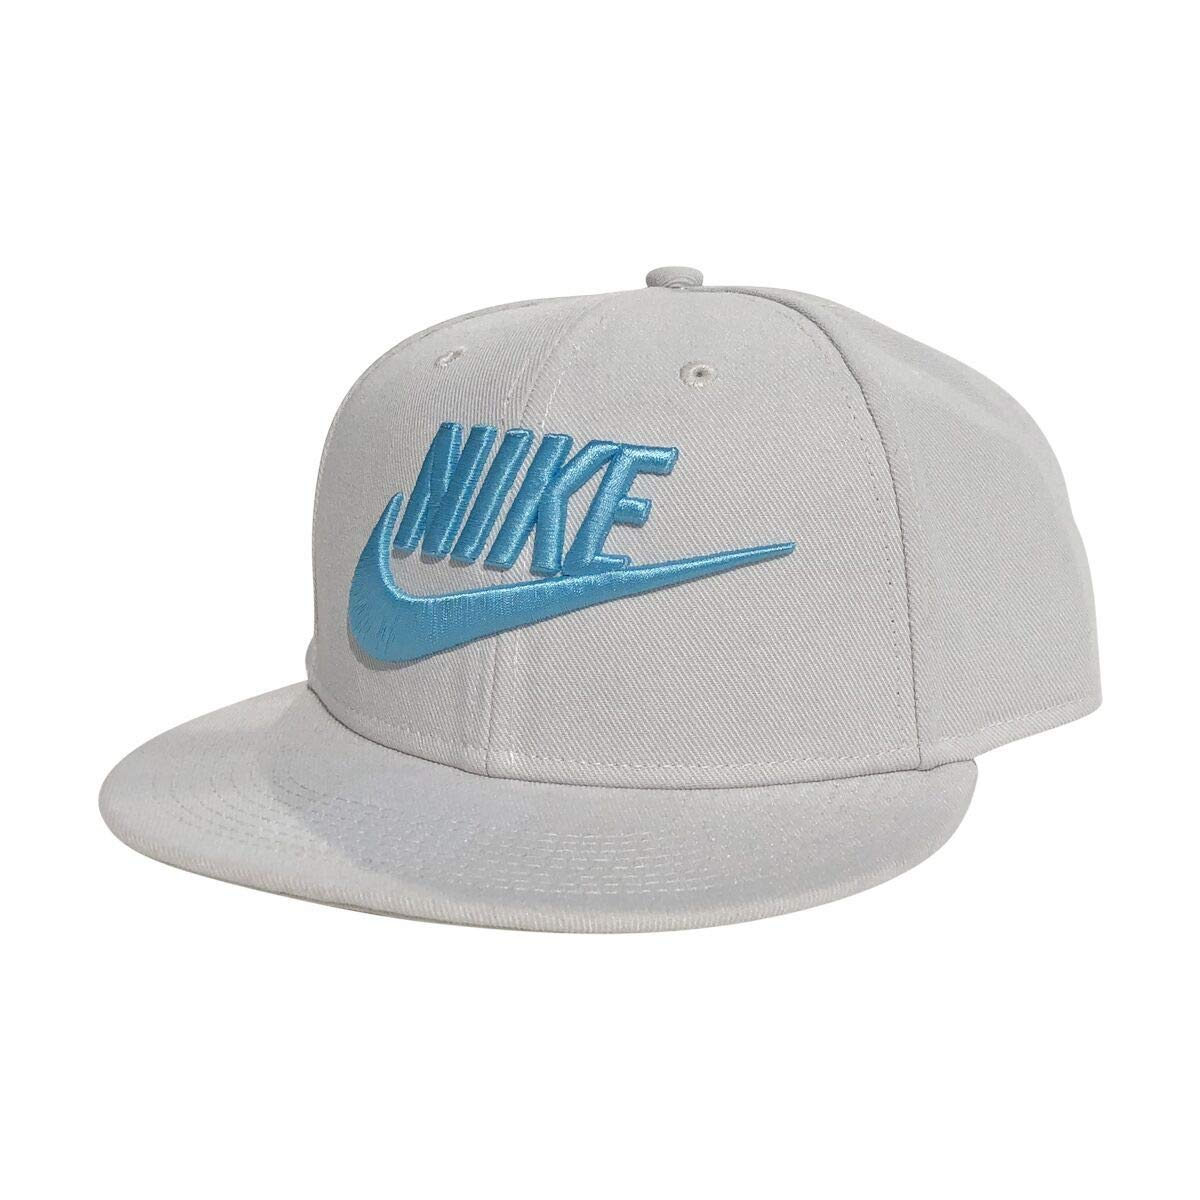 NIKE Mens True Sb-Futura Hat (Light Bone/Blue, One Size)